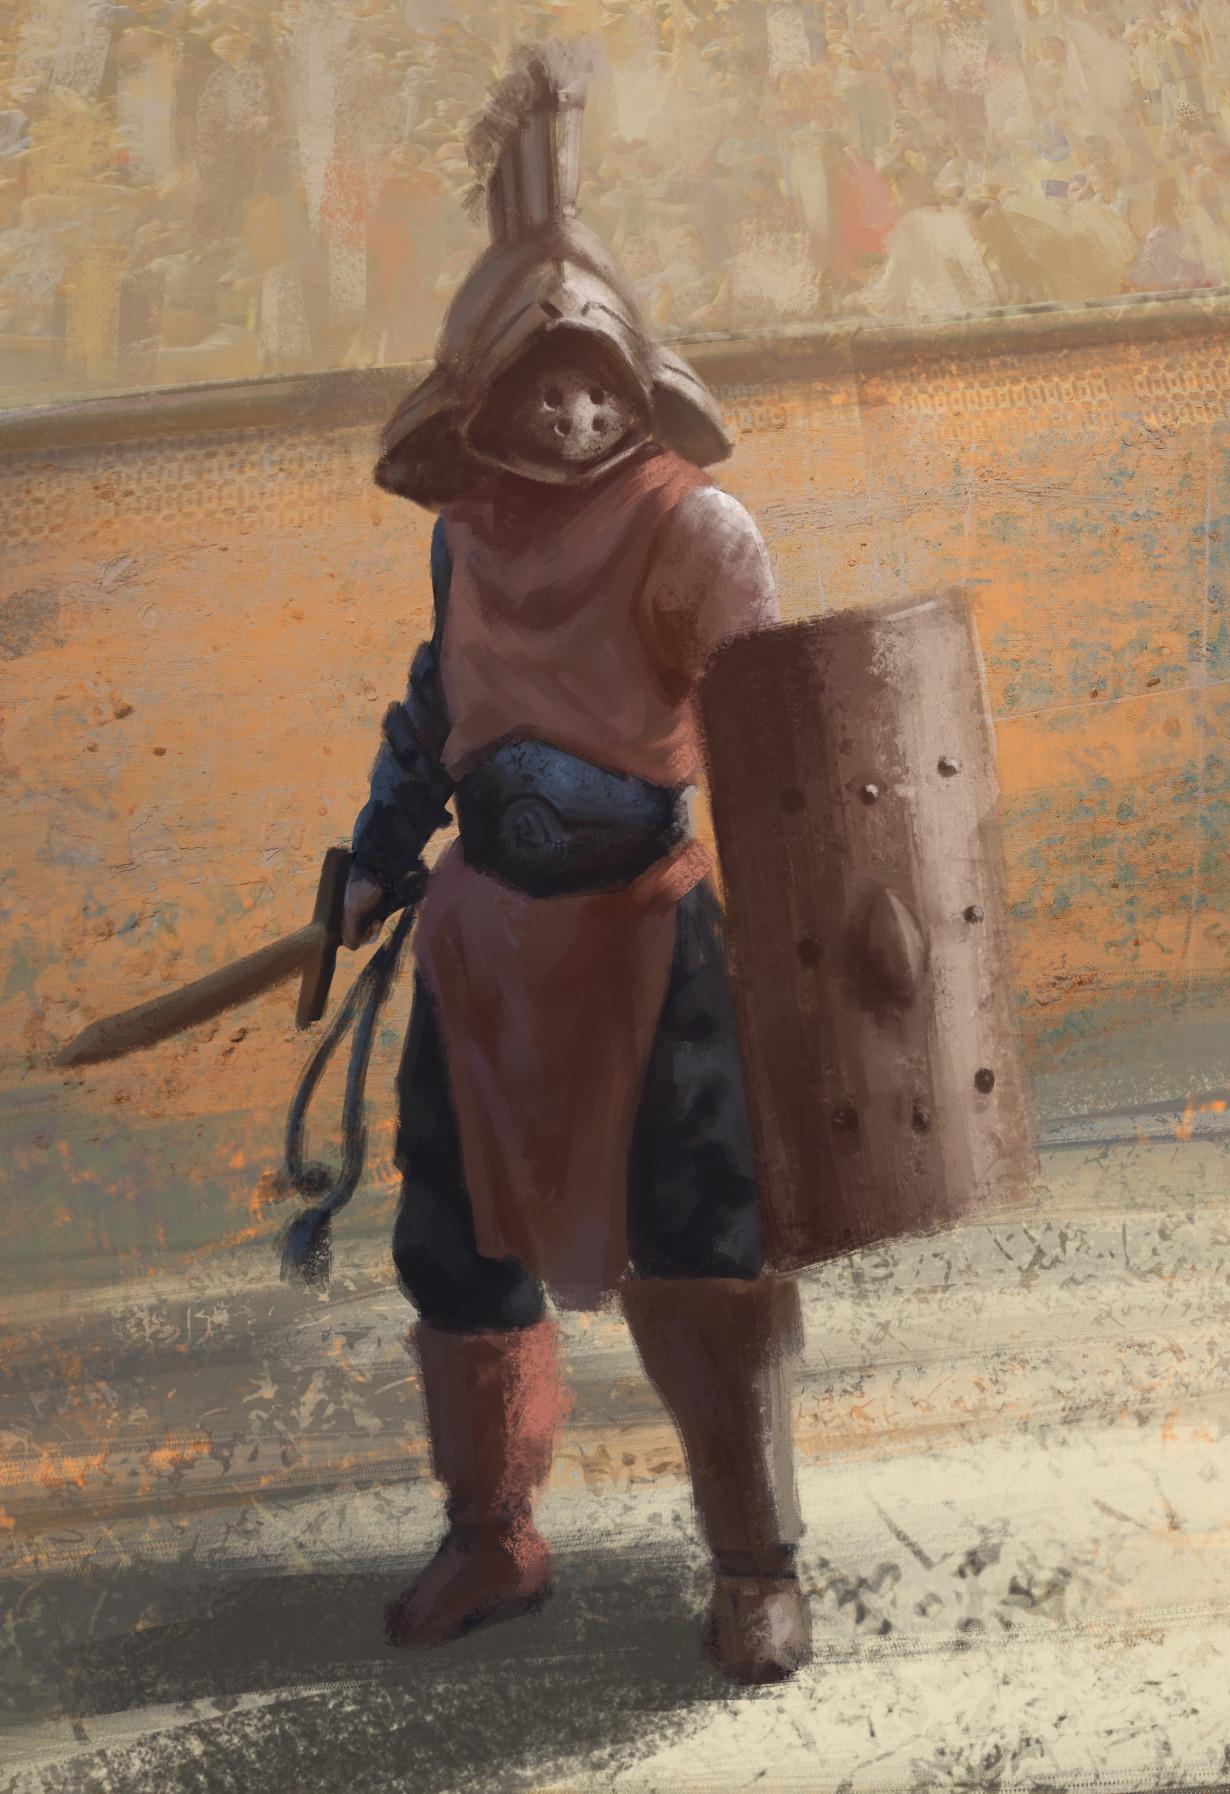 Manuel robles gladitator